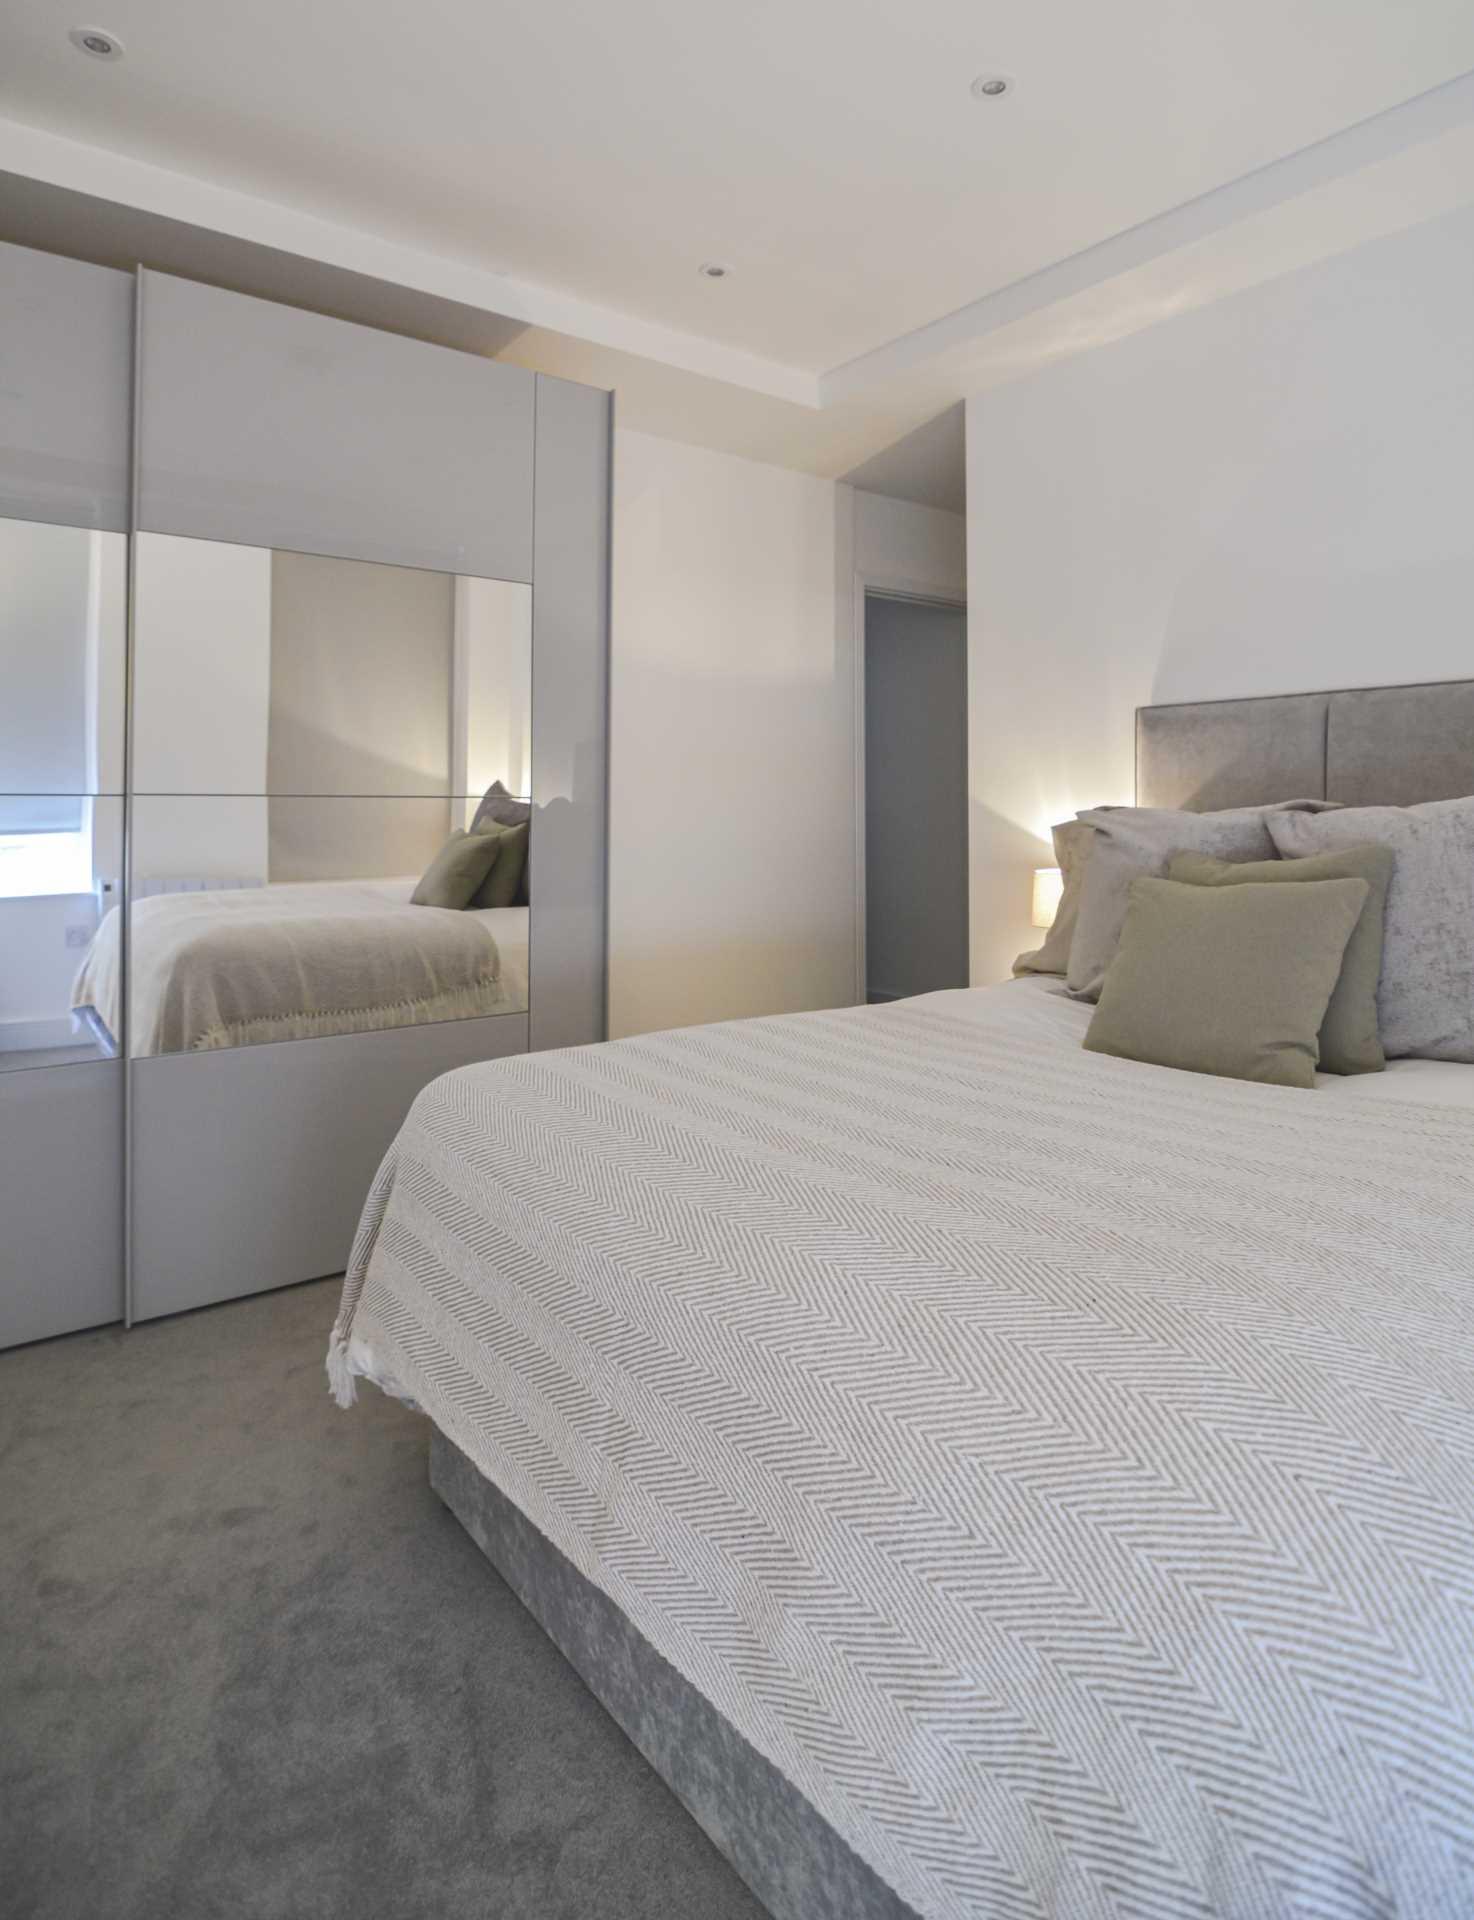 Flat 6, Waterloo Apartments, Image 8